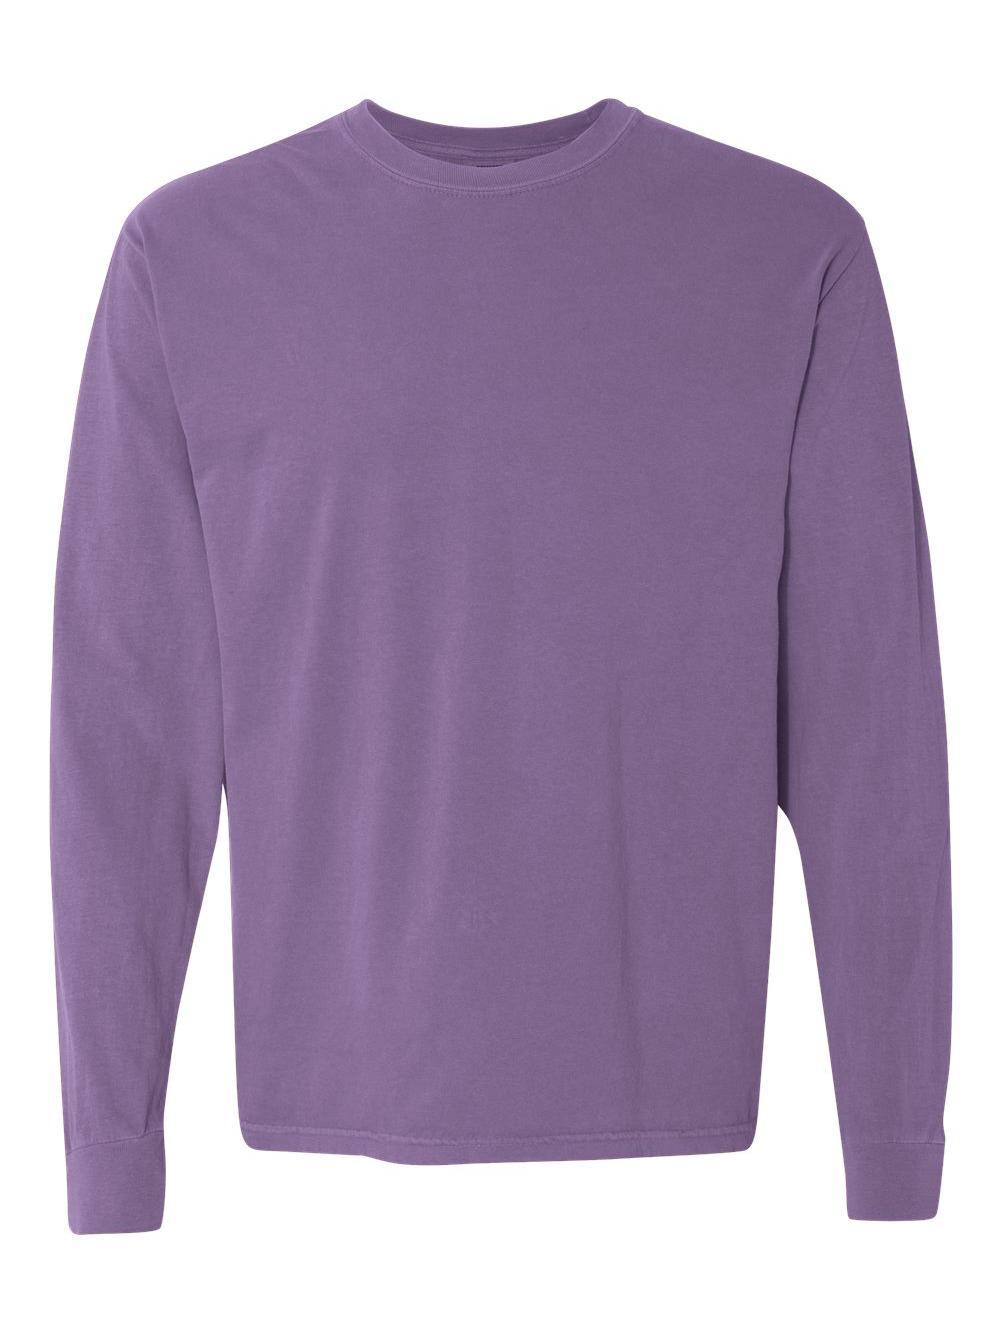 Comfort-Colors-Garment-Dyed-Heavyweight-Ringspun-Long-Sleeve-T-Shirt-6014 thumbnail 66